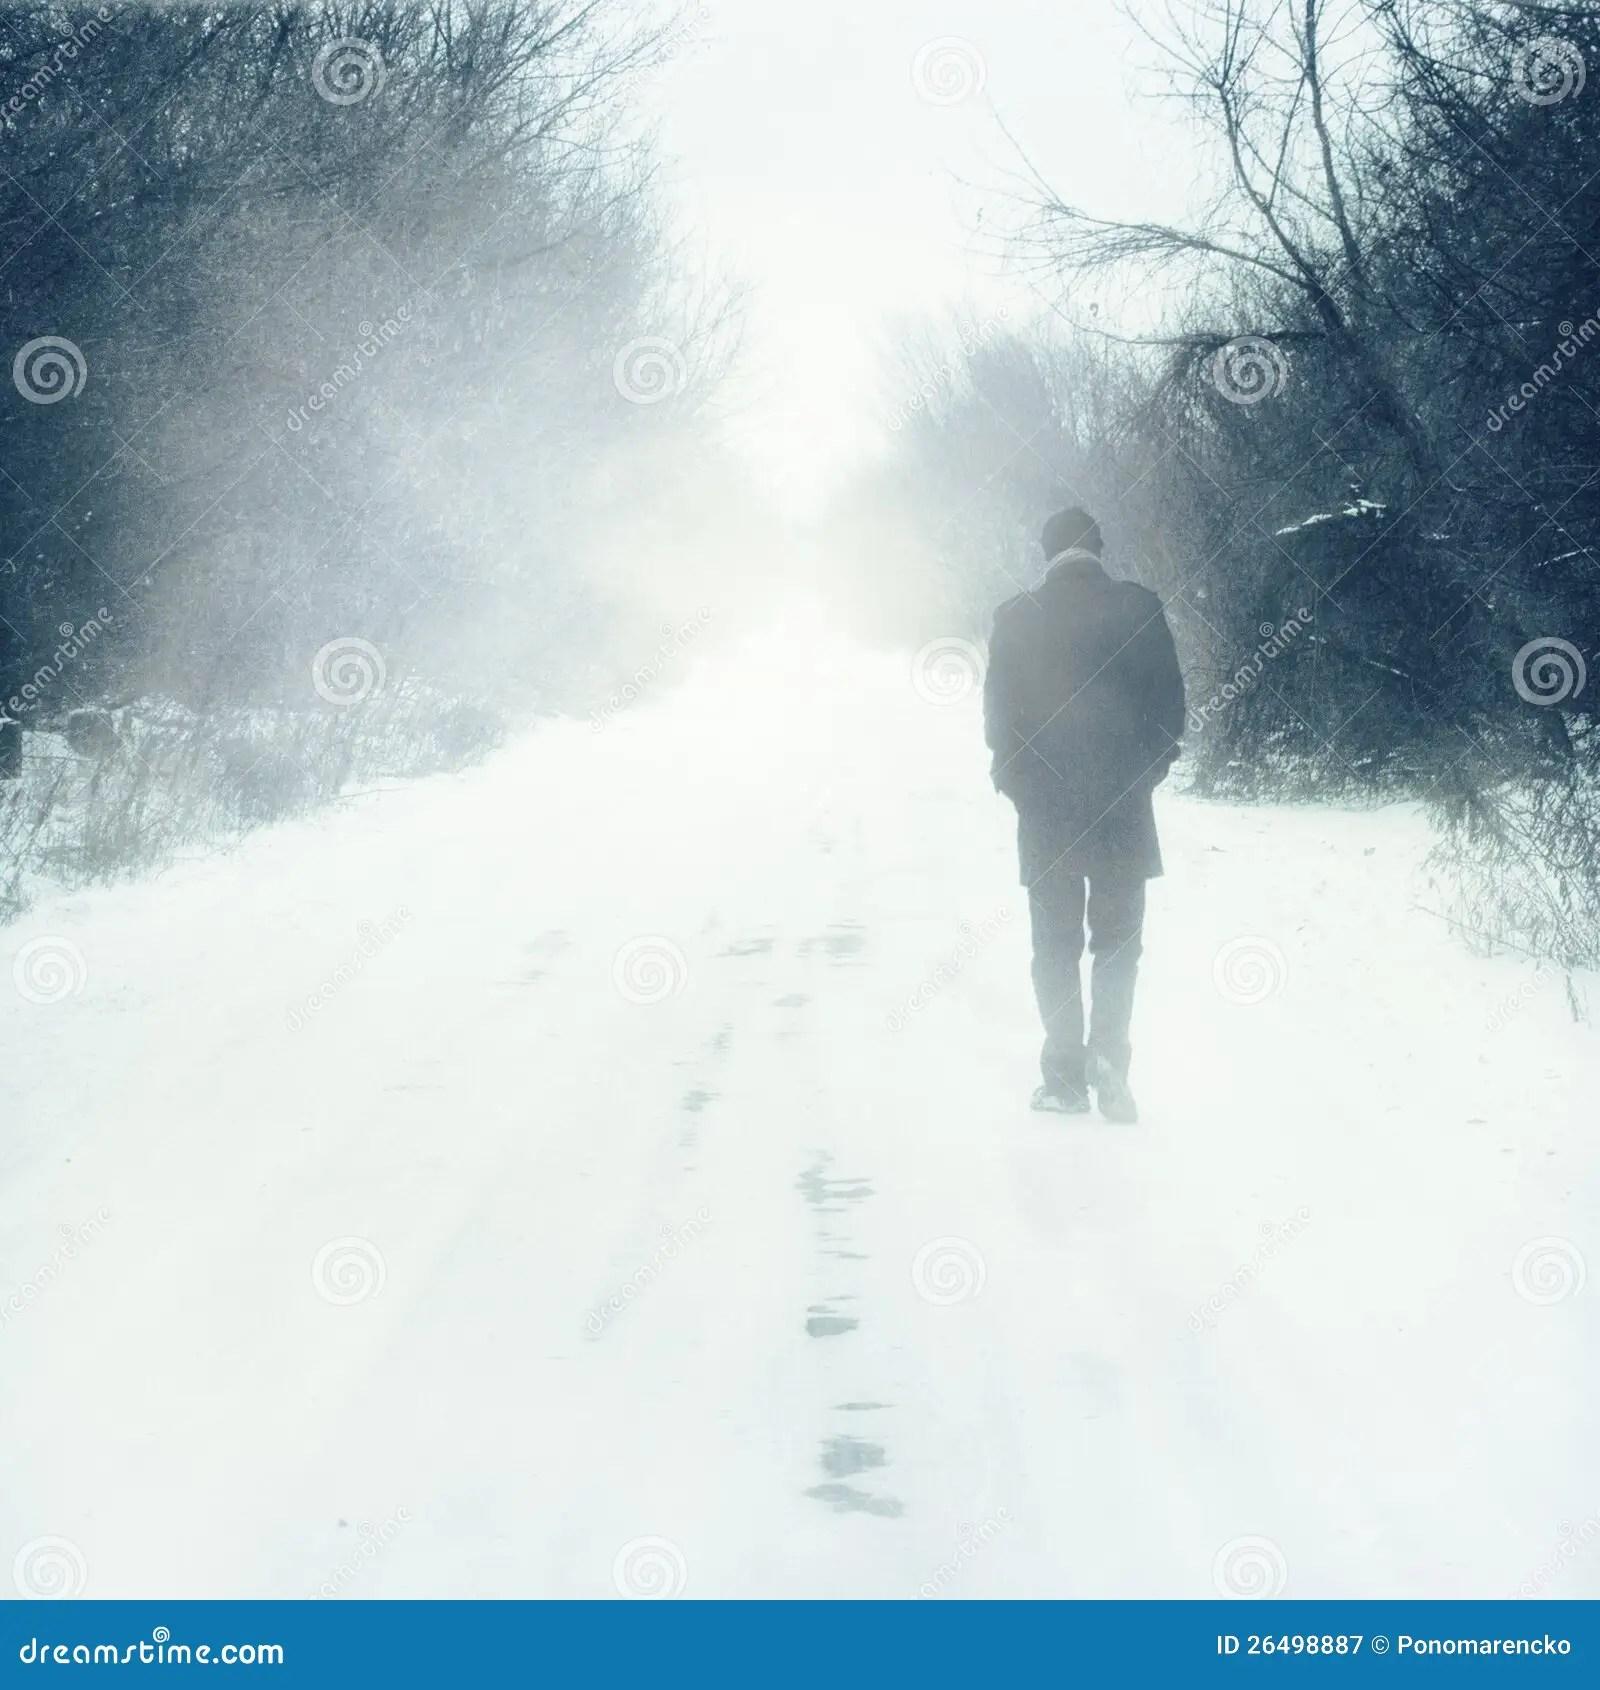 Wallpaper Download Alone Girl Man Walks Alone Stock Image Image Of Walk Himself